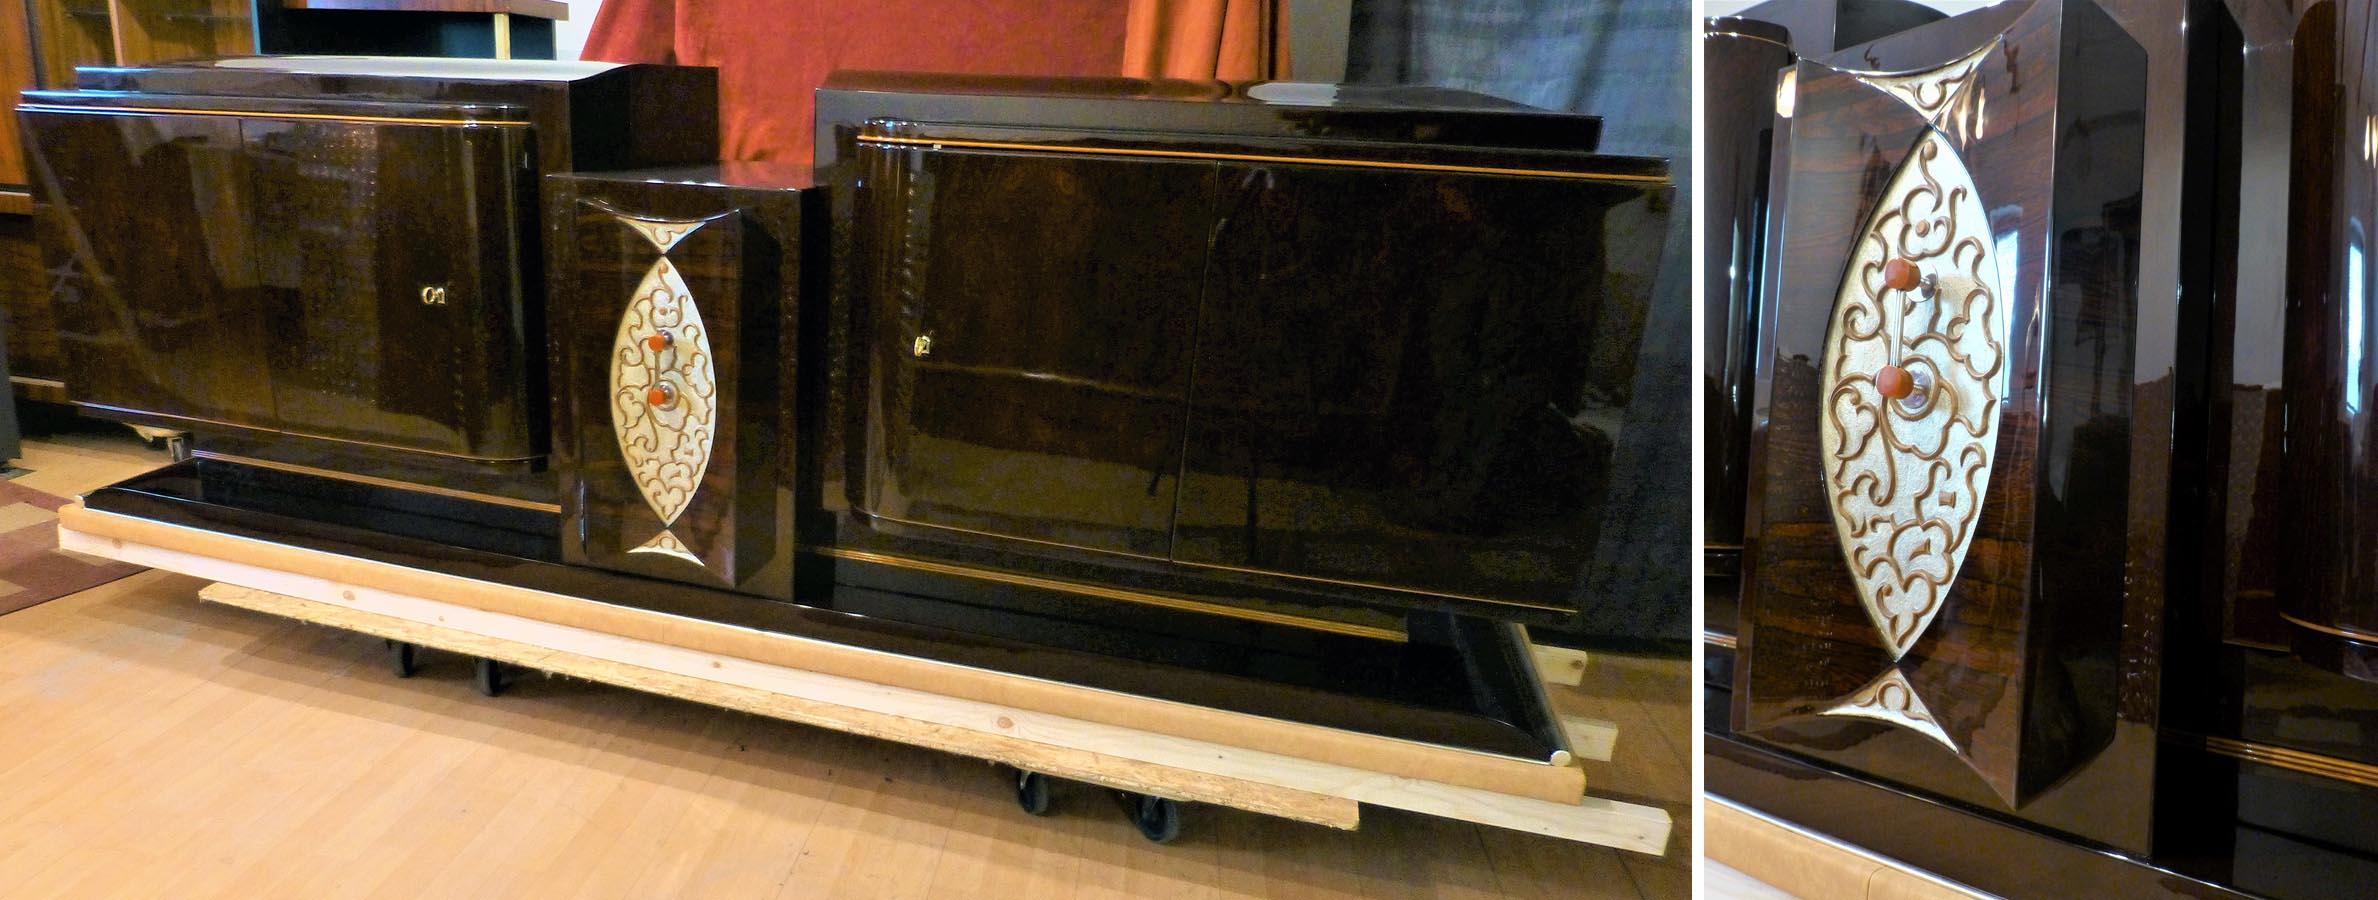 Art Deco Sideboard, Palisander restauriert, lackiert , poliert